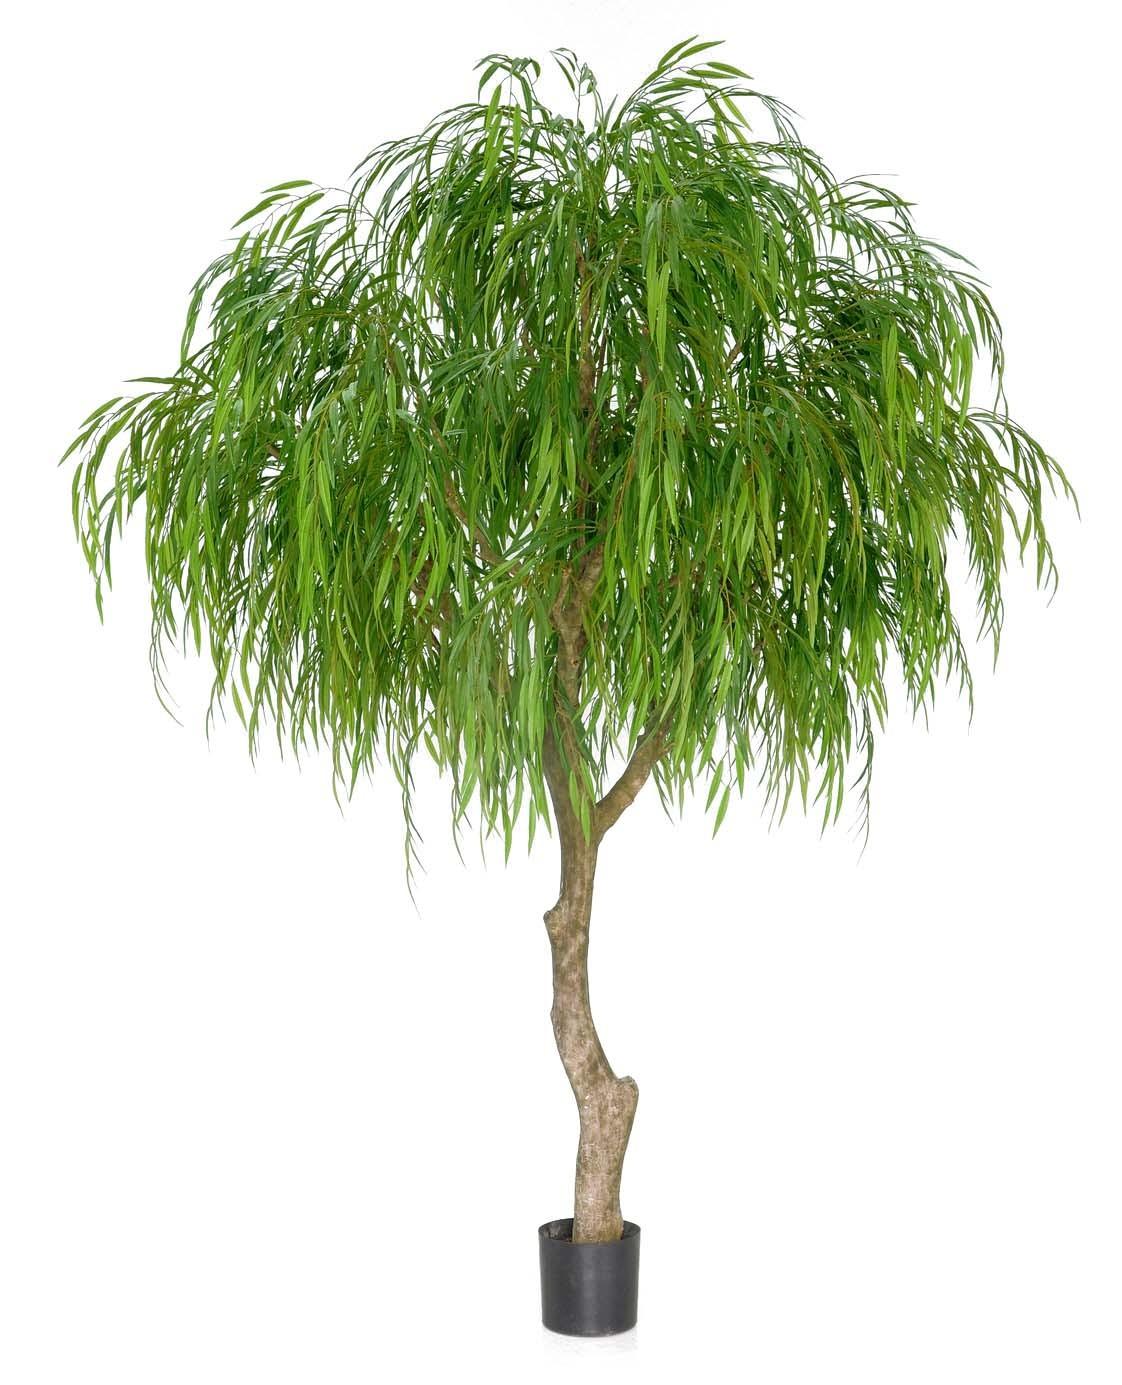 tårpil, Weeping willow tree